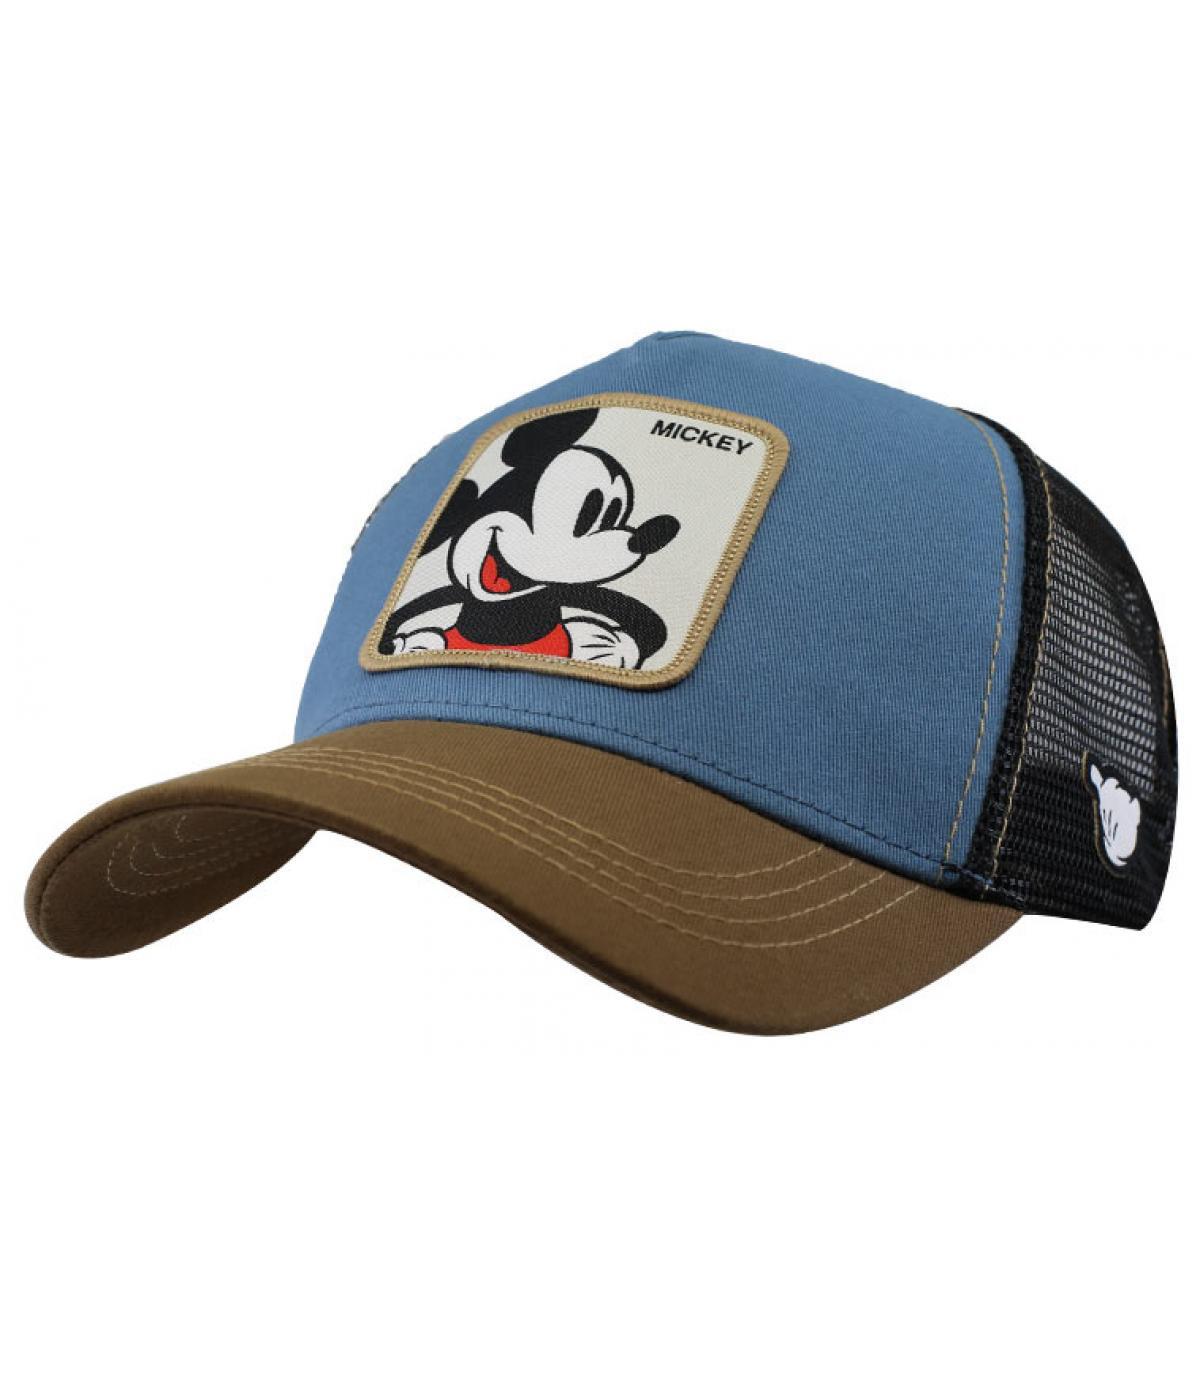 Détails Trucker Mickey - image 2